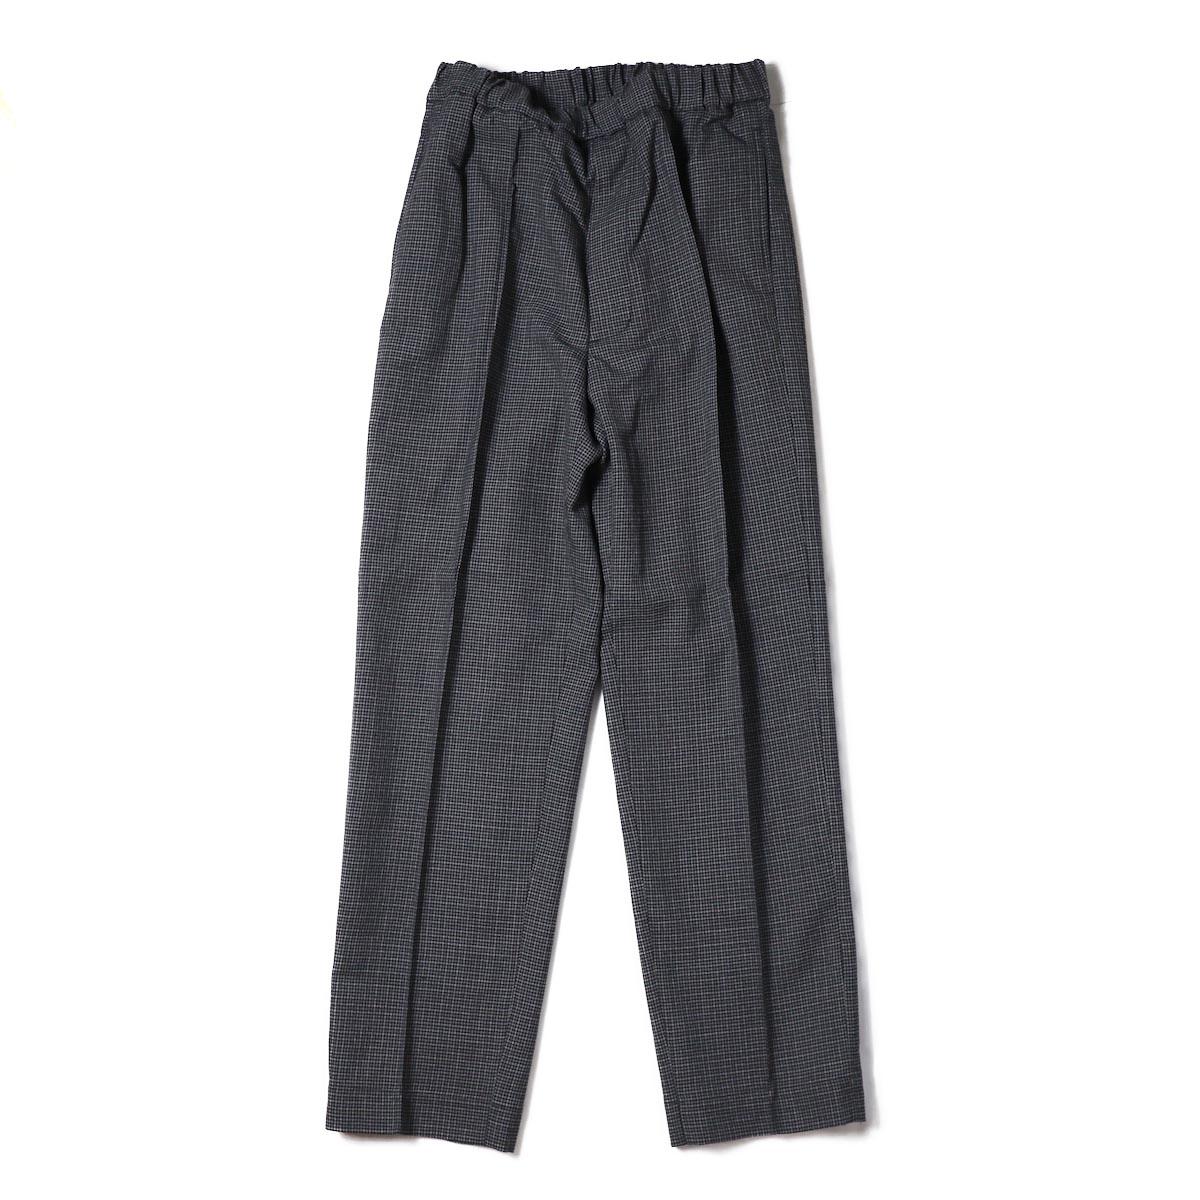 Kaptain Sunshine / Crease Tucked Easy Pants -Grey Hound